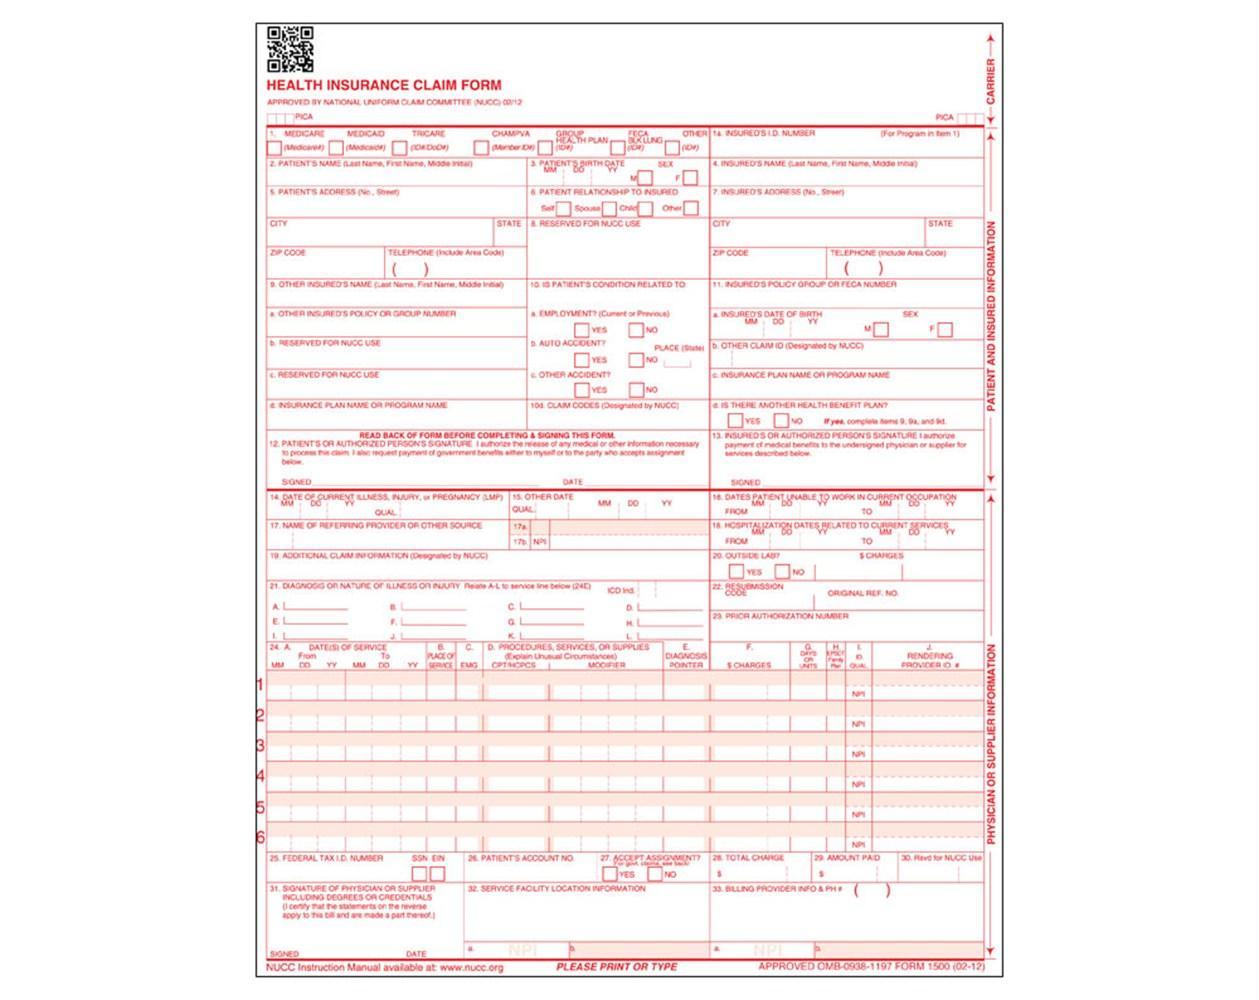 Cms 1500 Form 0212 Download